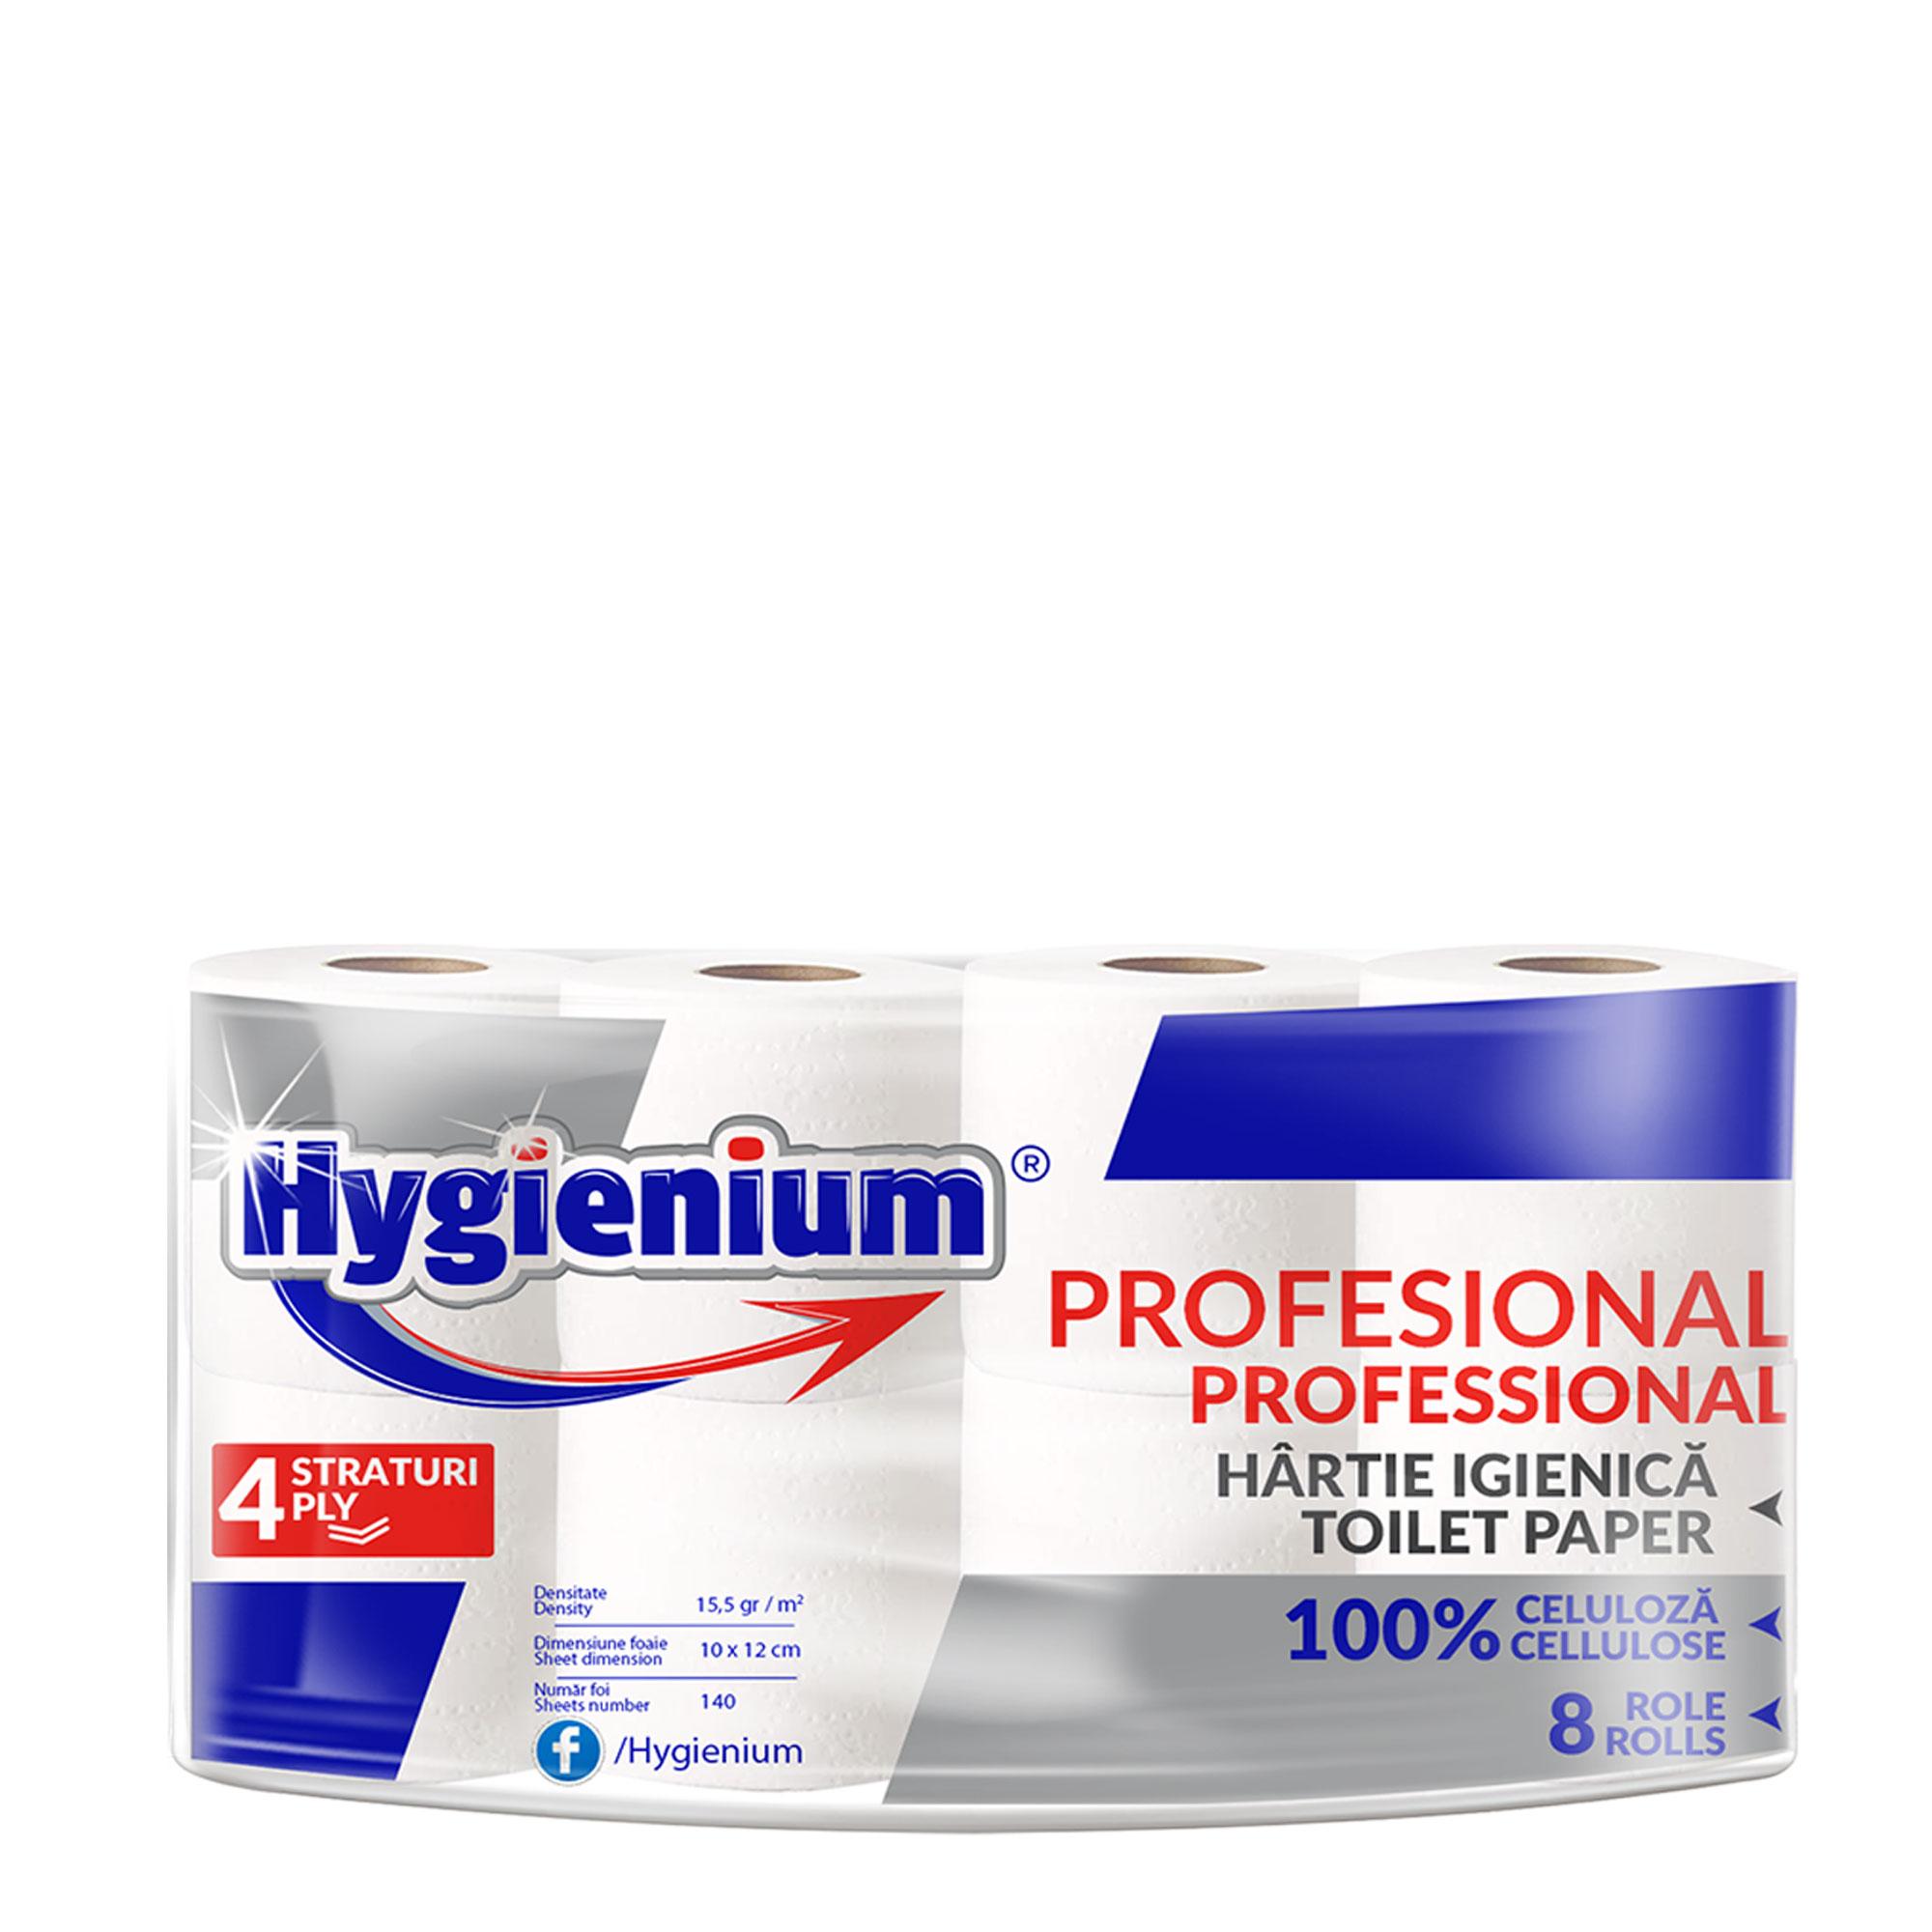 Hygienium Professional Toilet Paper 8 rolls